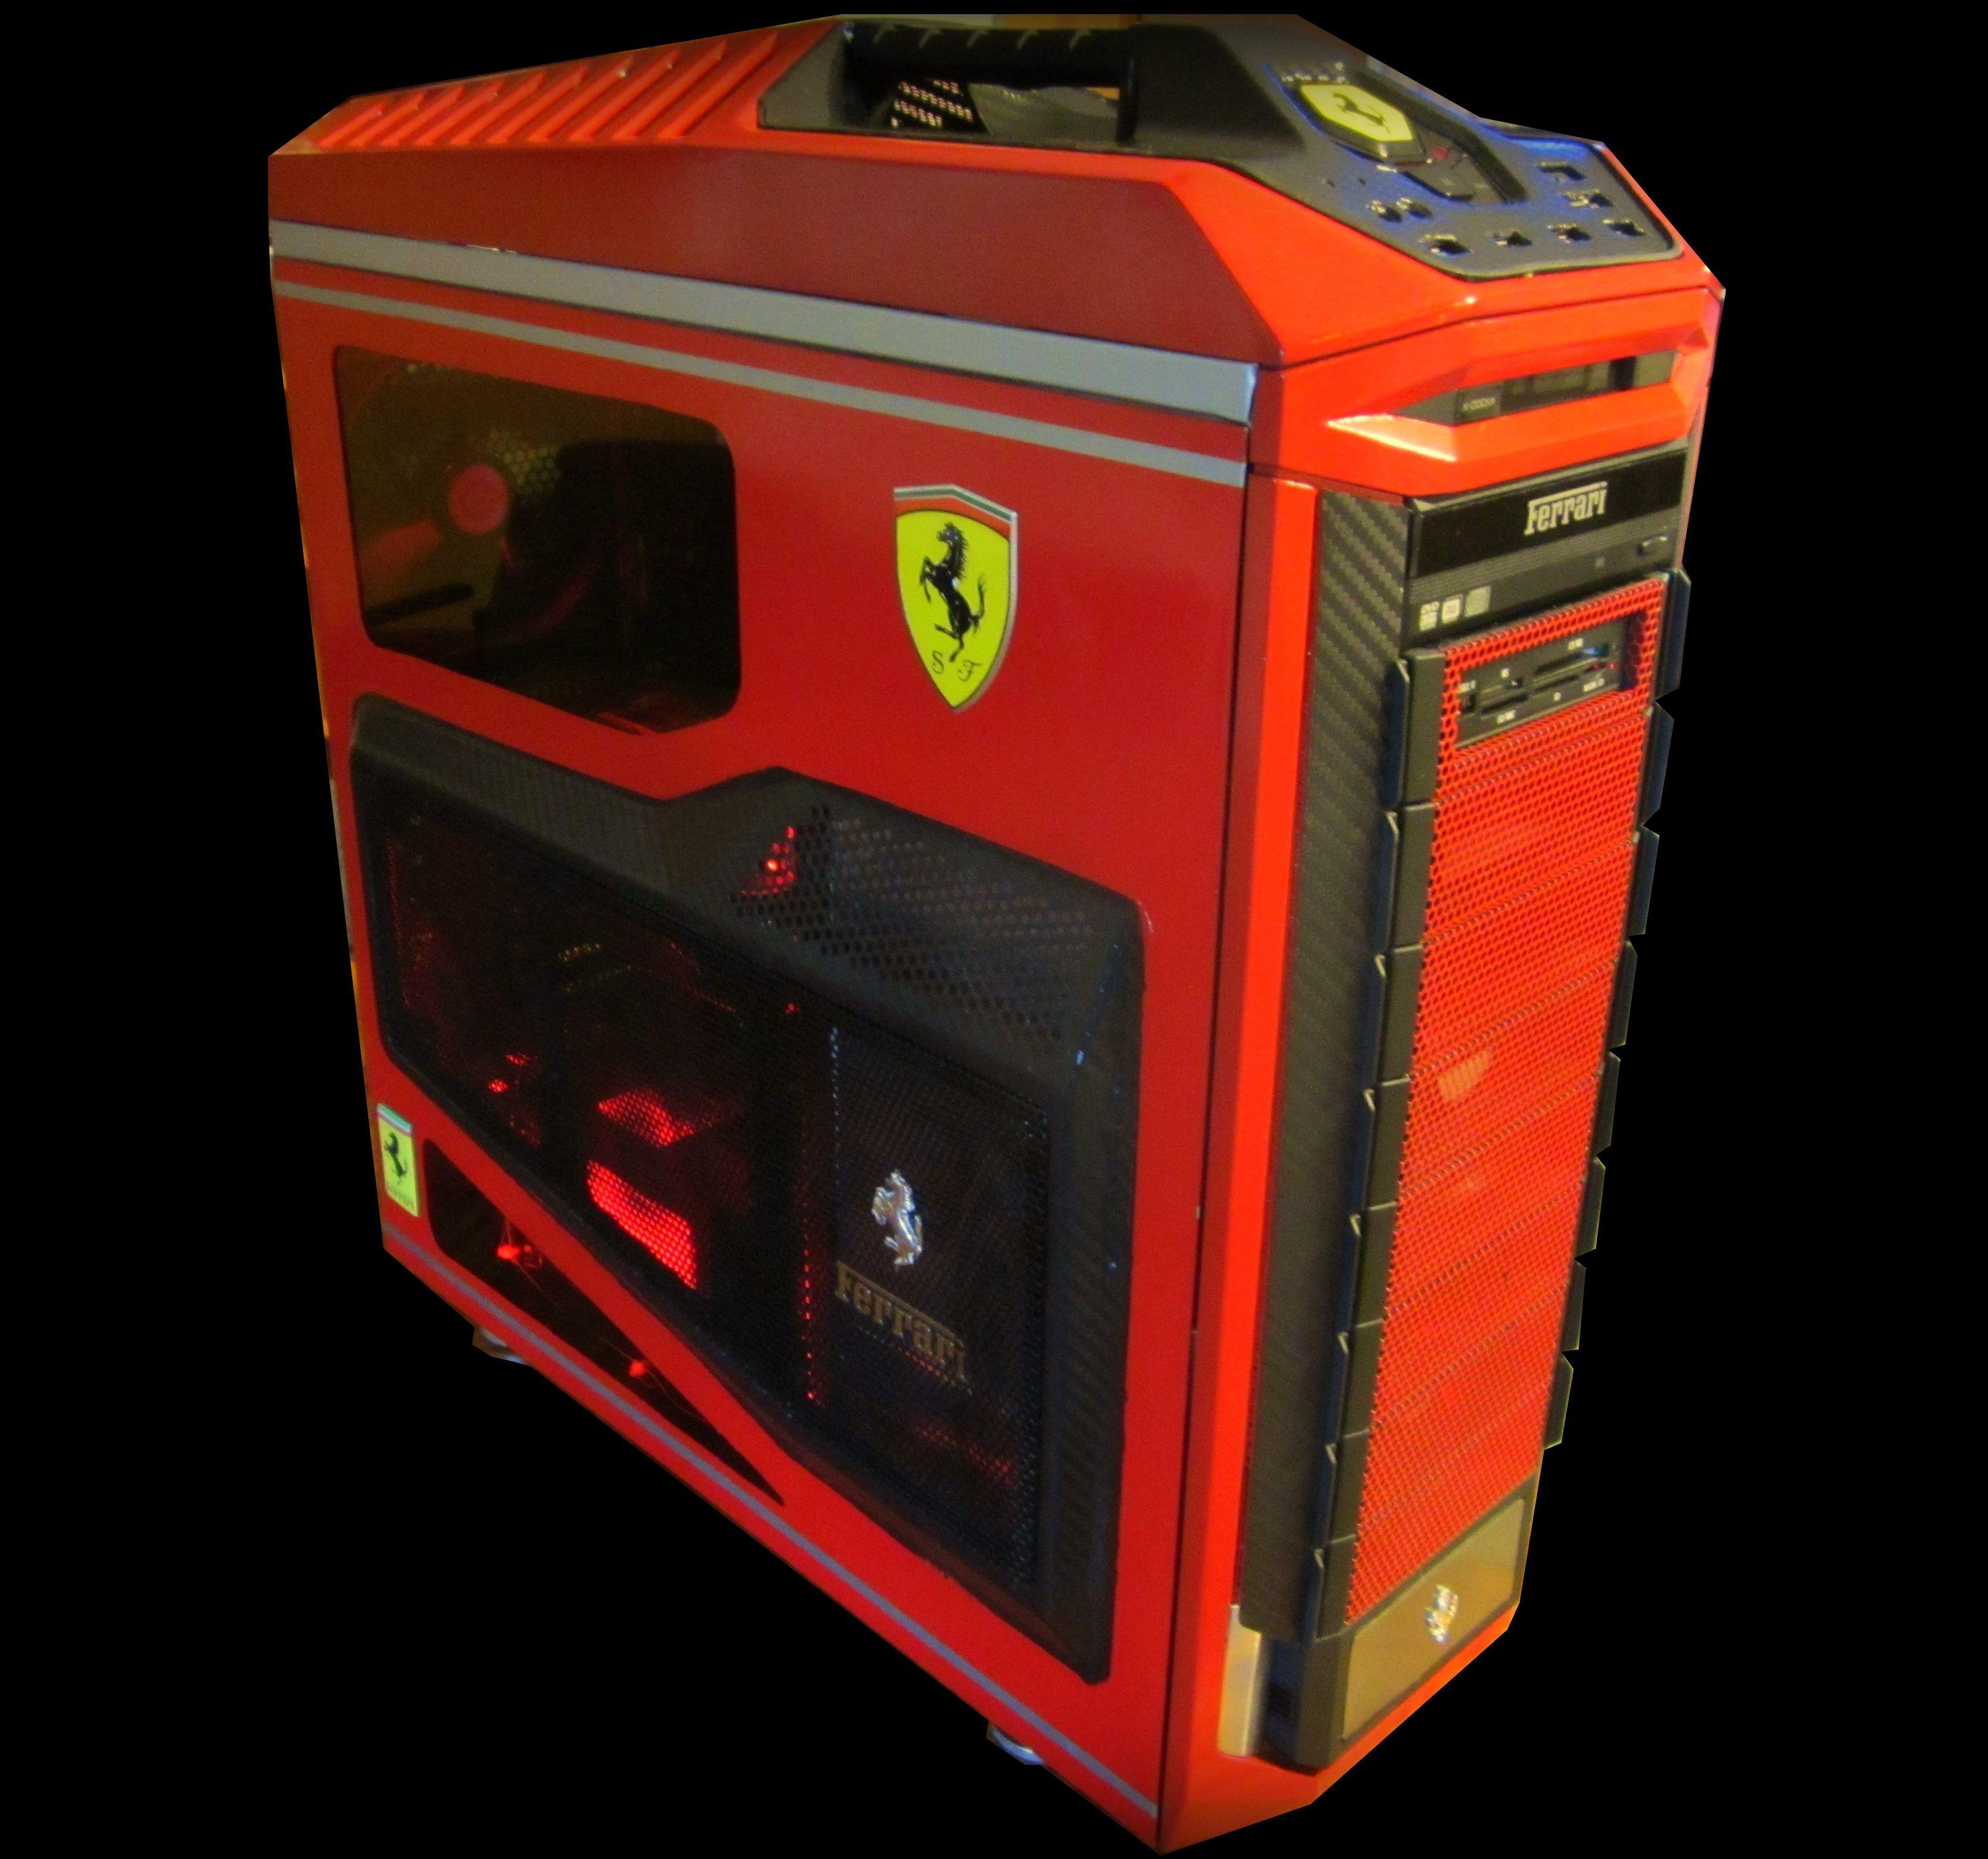 The Ferrari 599 Gto Tribute Build By Enigma And Unknown Ferrari 599 Gaming Pc Build Hot Rodder